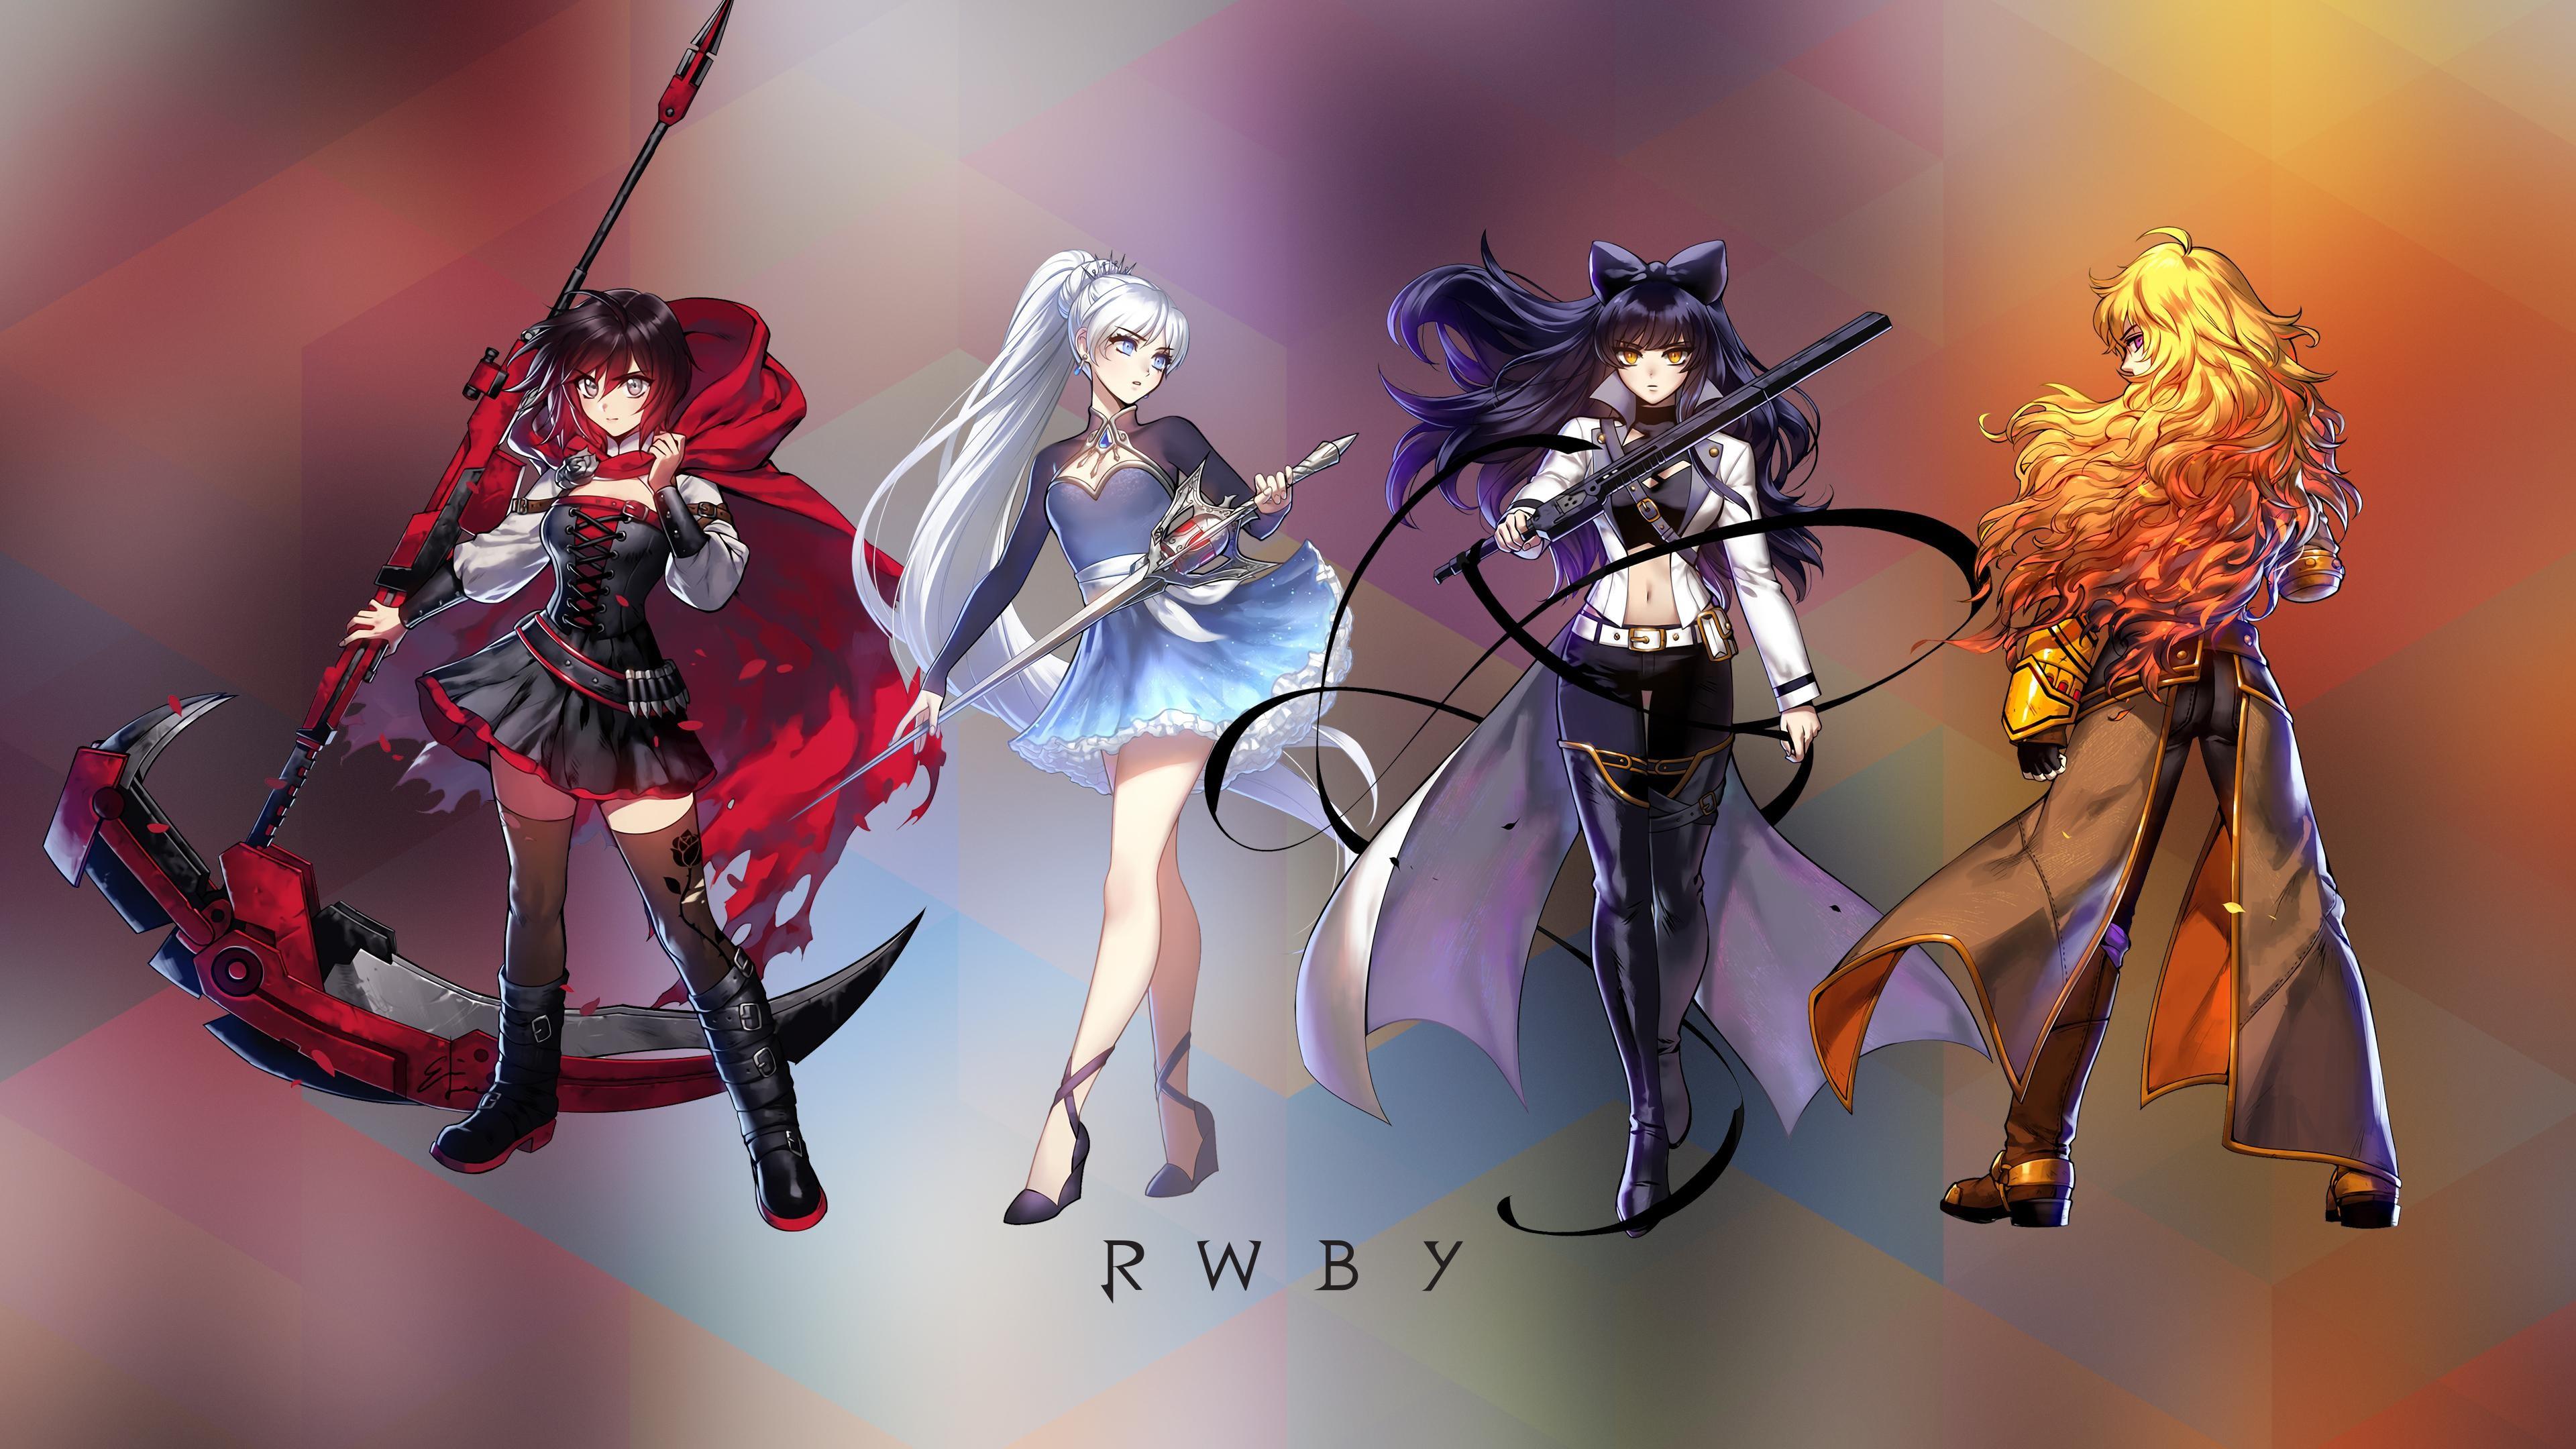 team rwby wallpaper